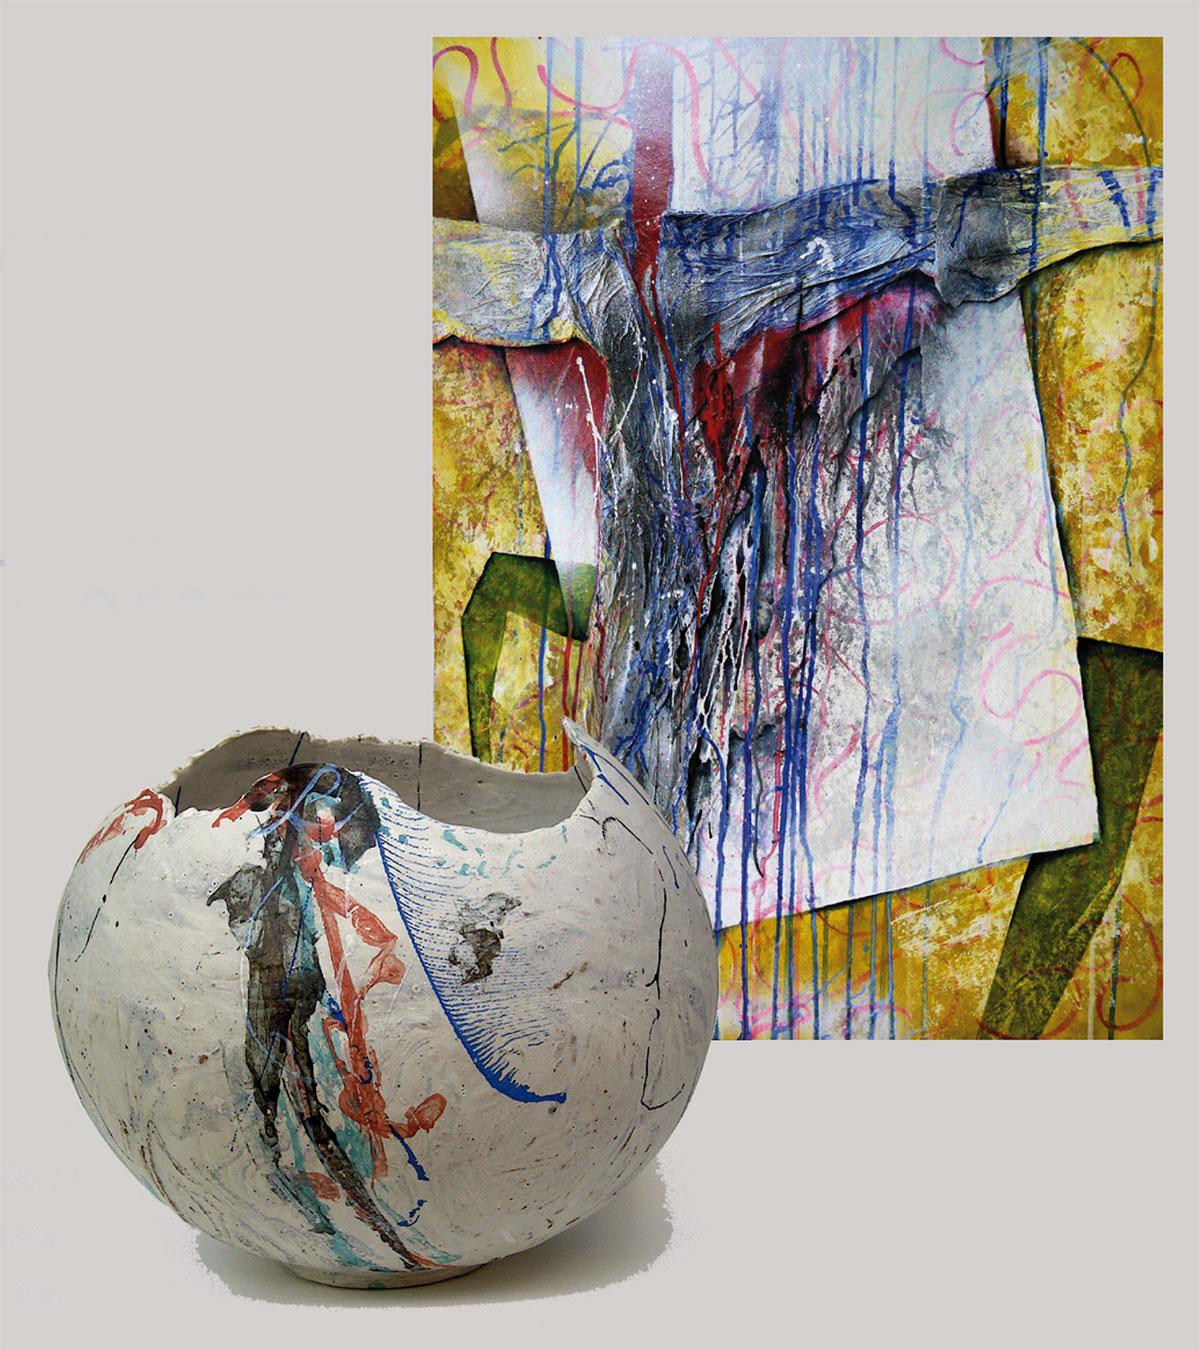 Hartwig Kolb, Malerei & Elisabeth Reusch-Heidenfelder, Keramik